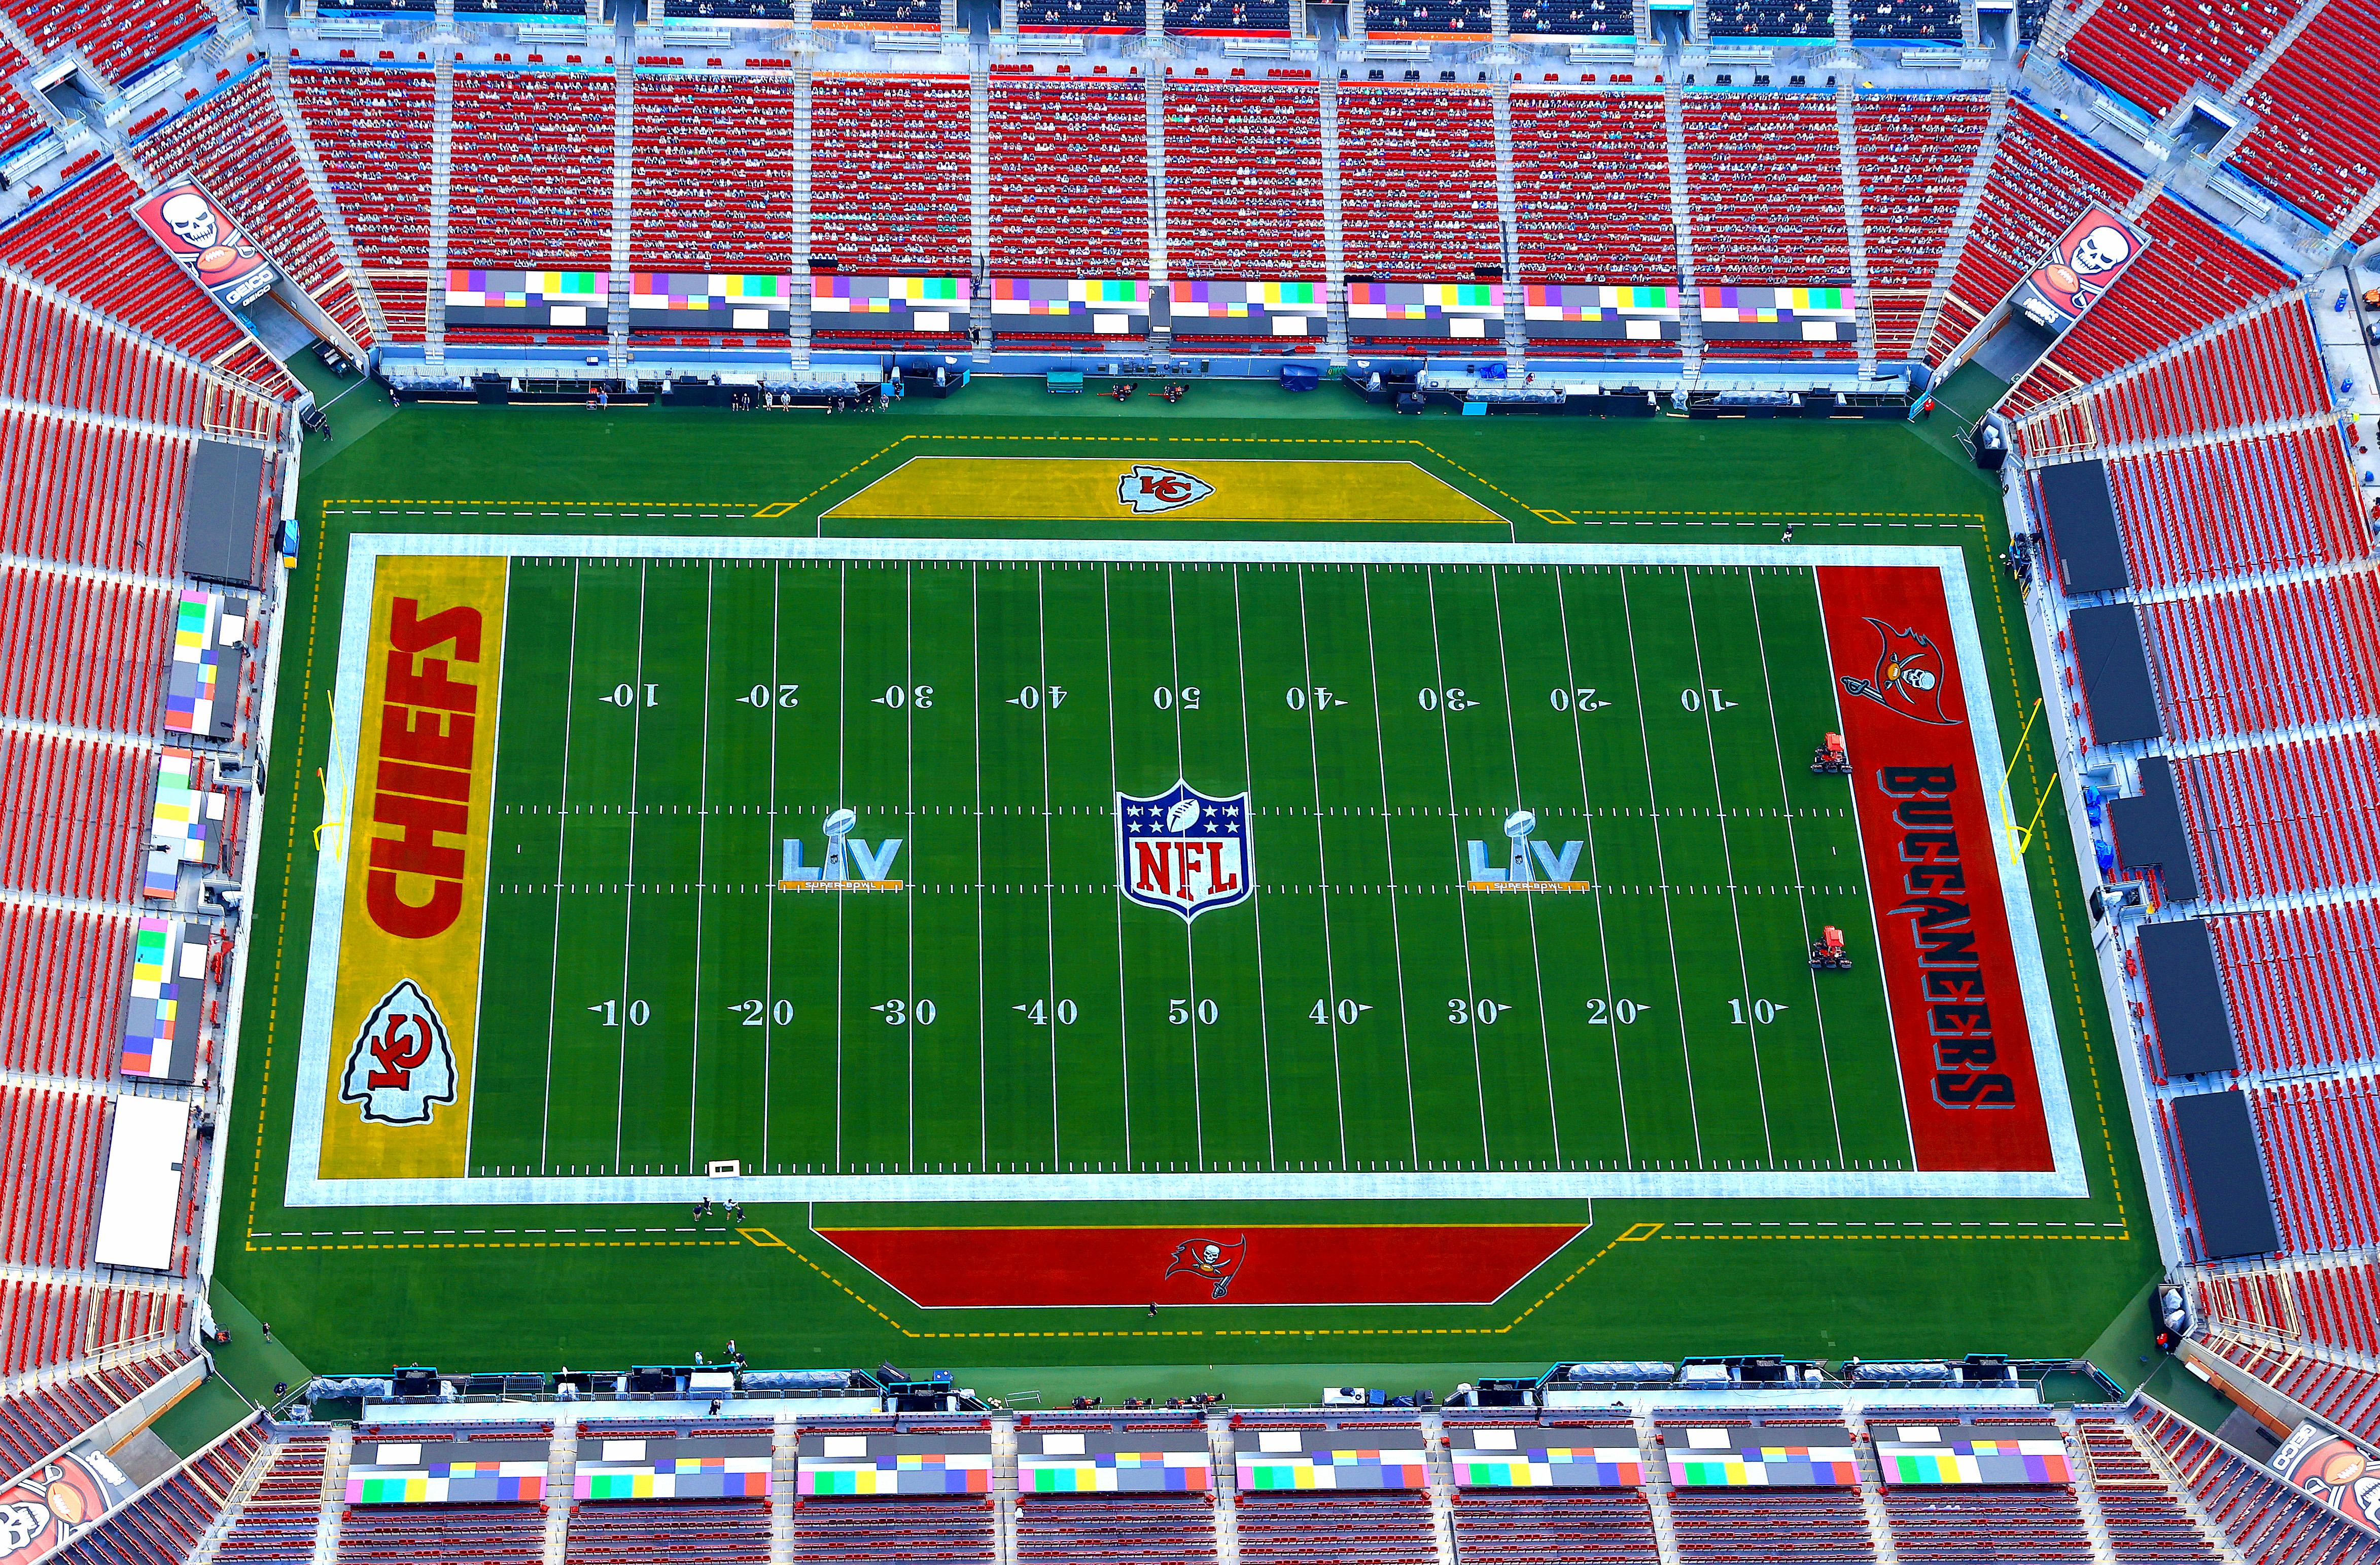 Super Bowl LV - Buccaneers vs. Chiefs